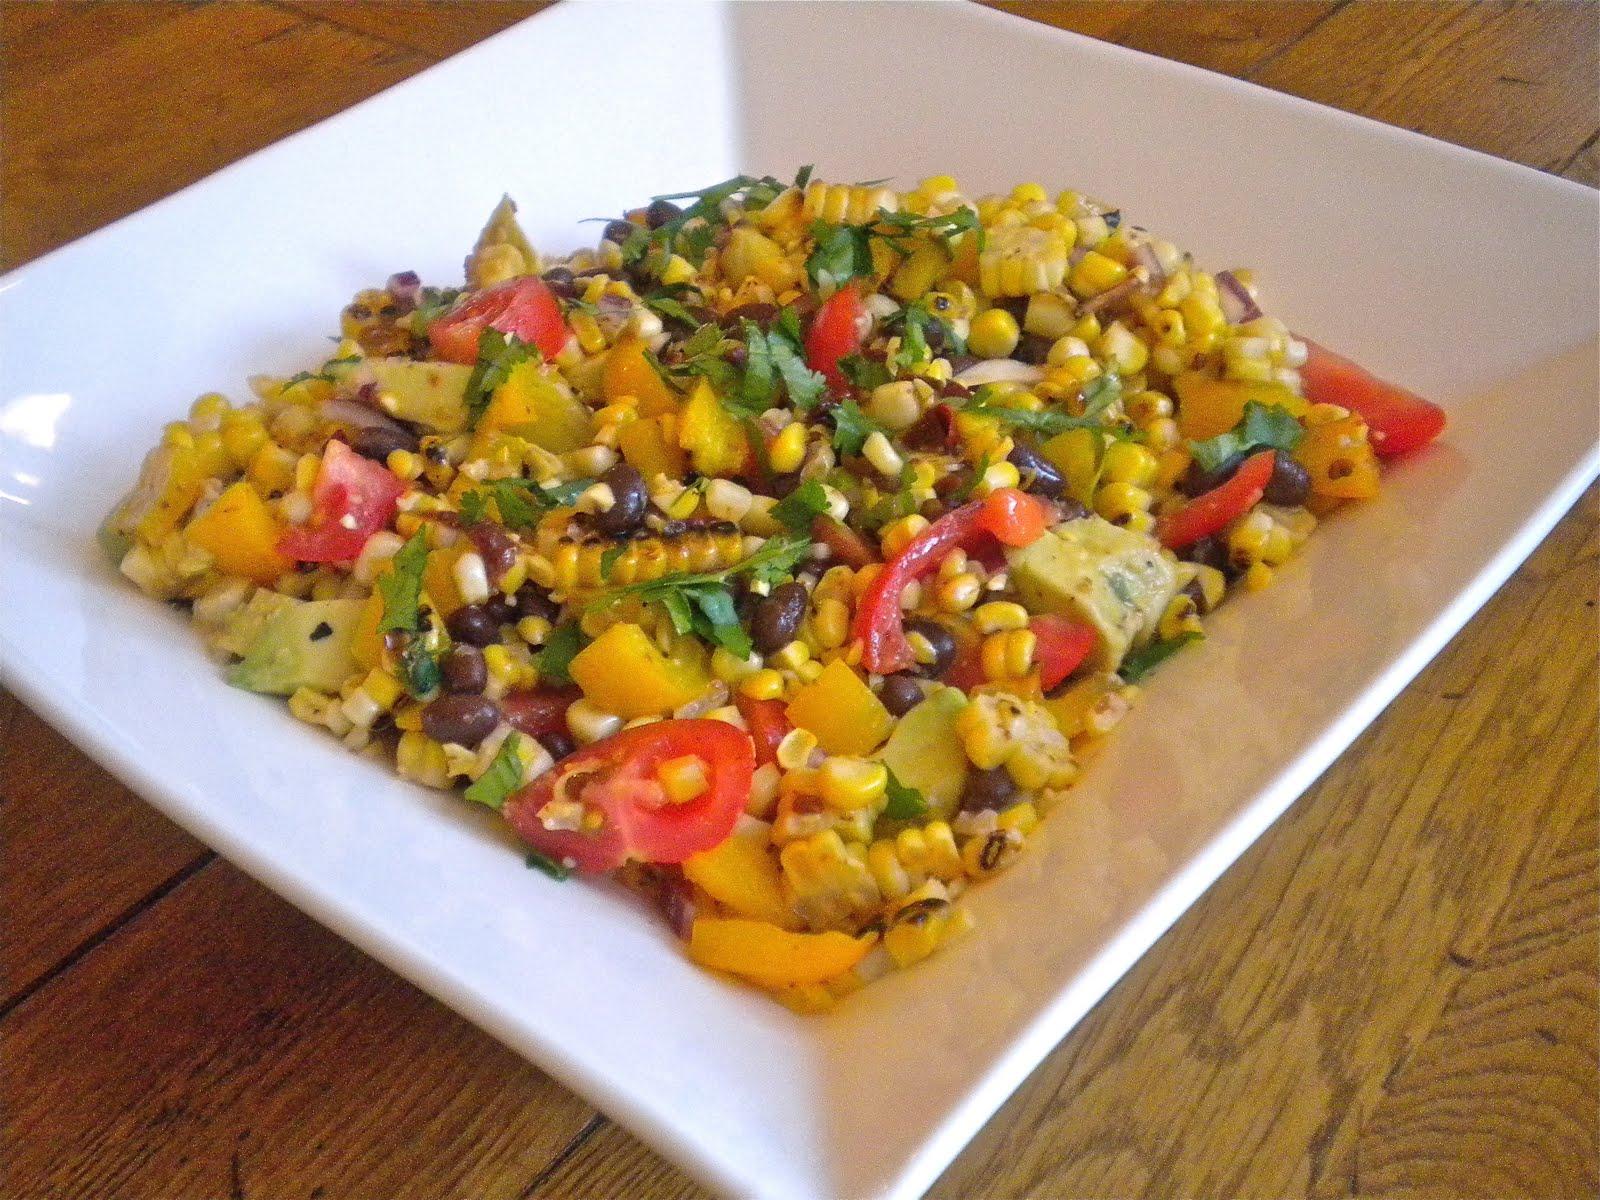 Kitchen Cactus: Southwestern Corn Salad